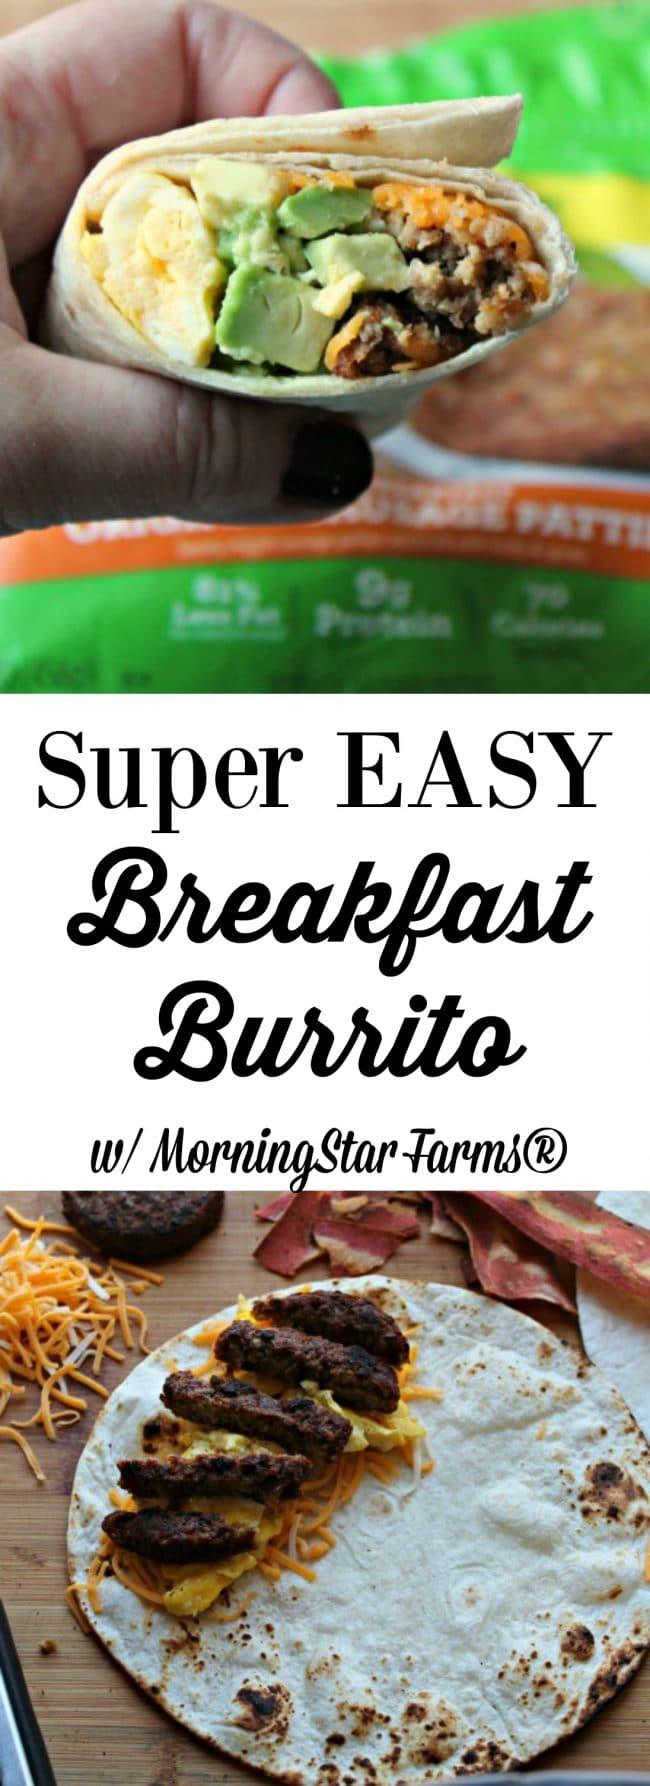 super easy breakfast burrito with MorningStar Farms®